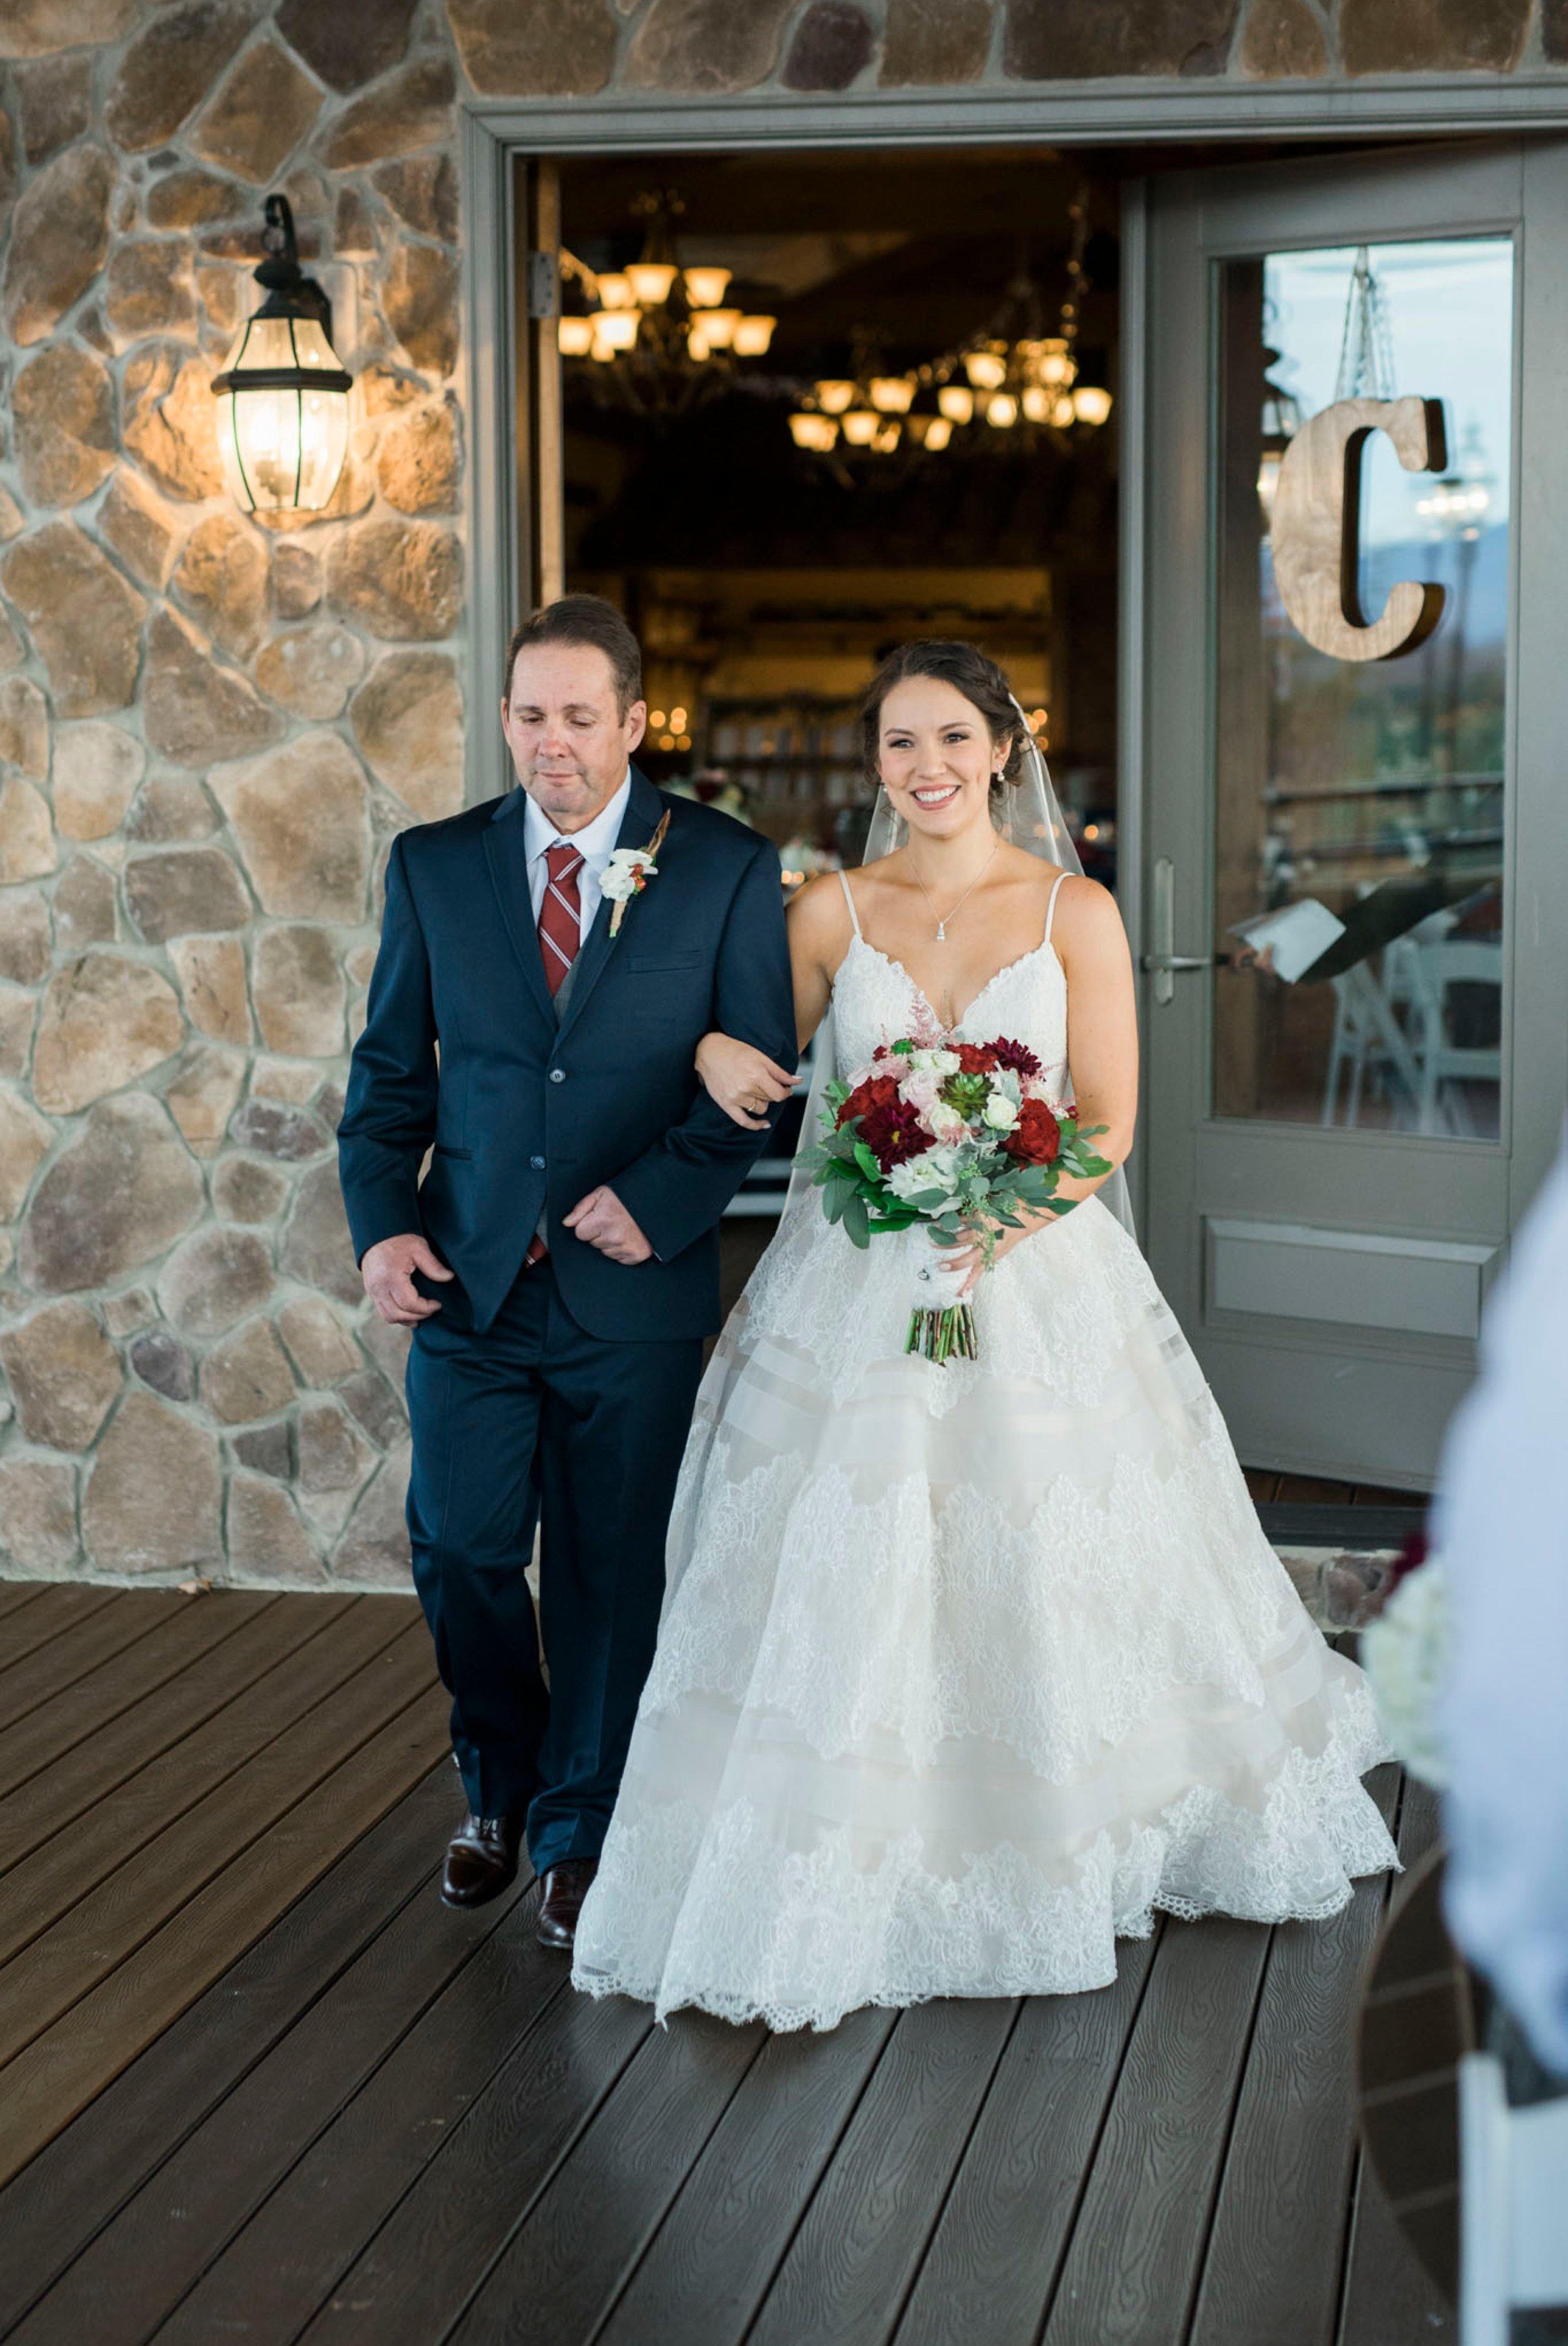 IrvineEstate_LexingtonVA_Wedding_FallWedding_VirginiaWeddingPhotographer 56.jpg